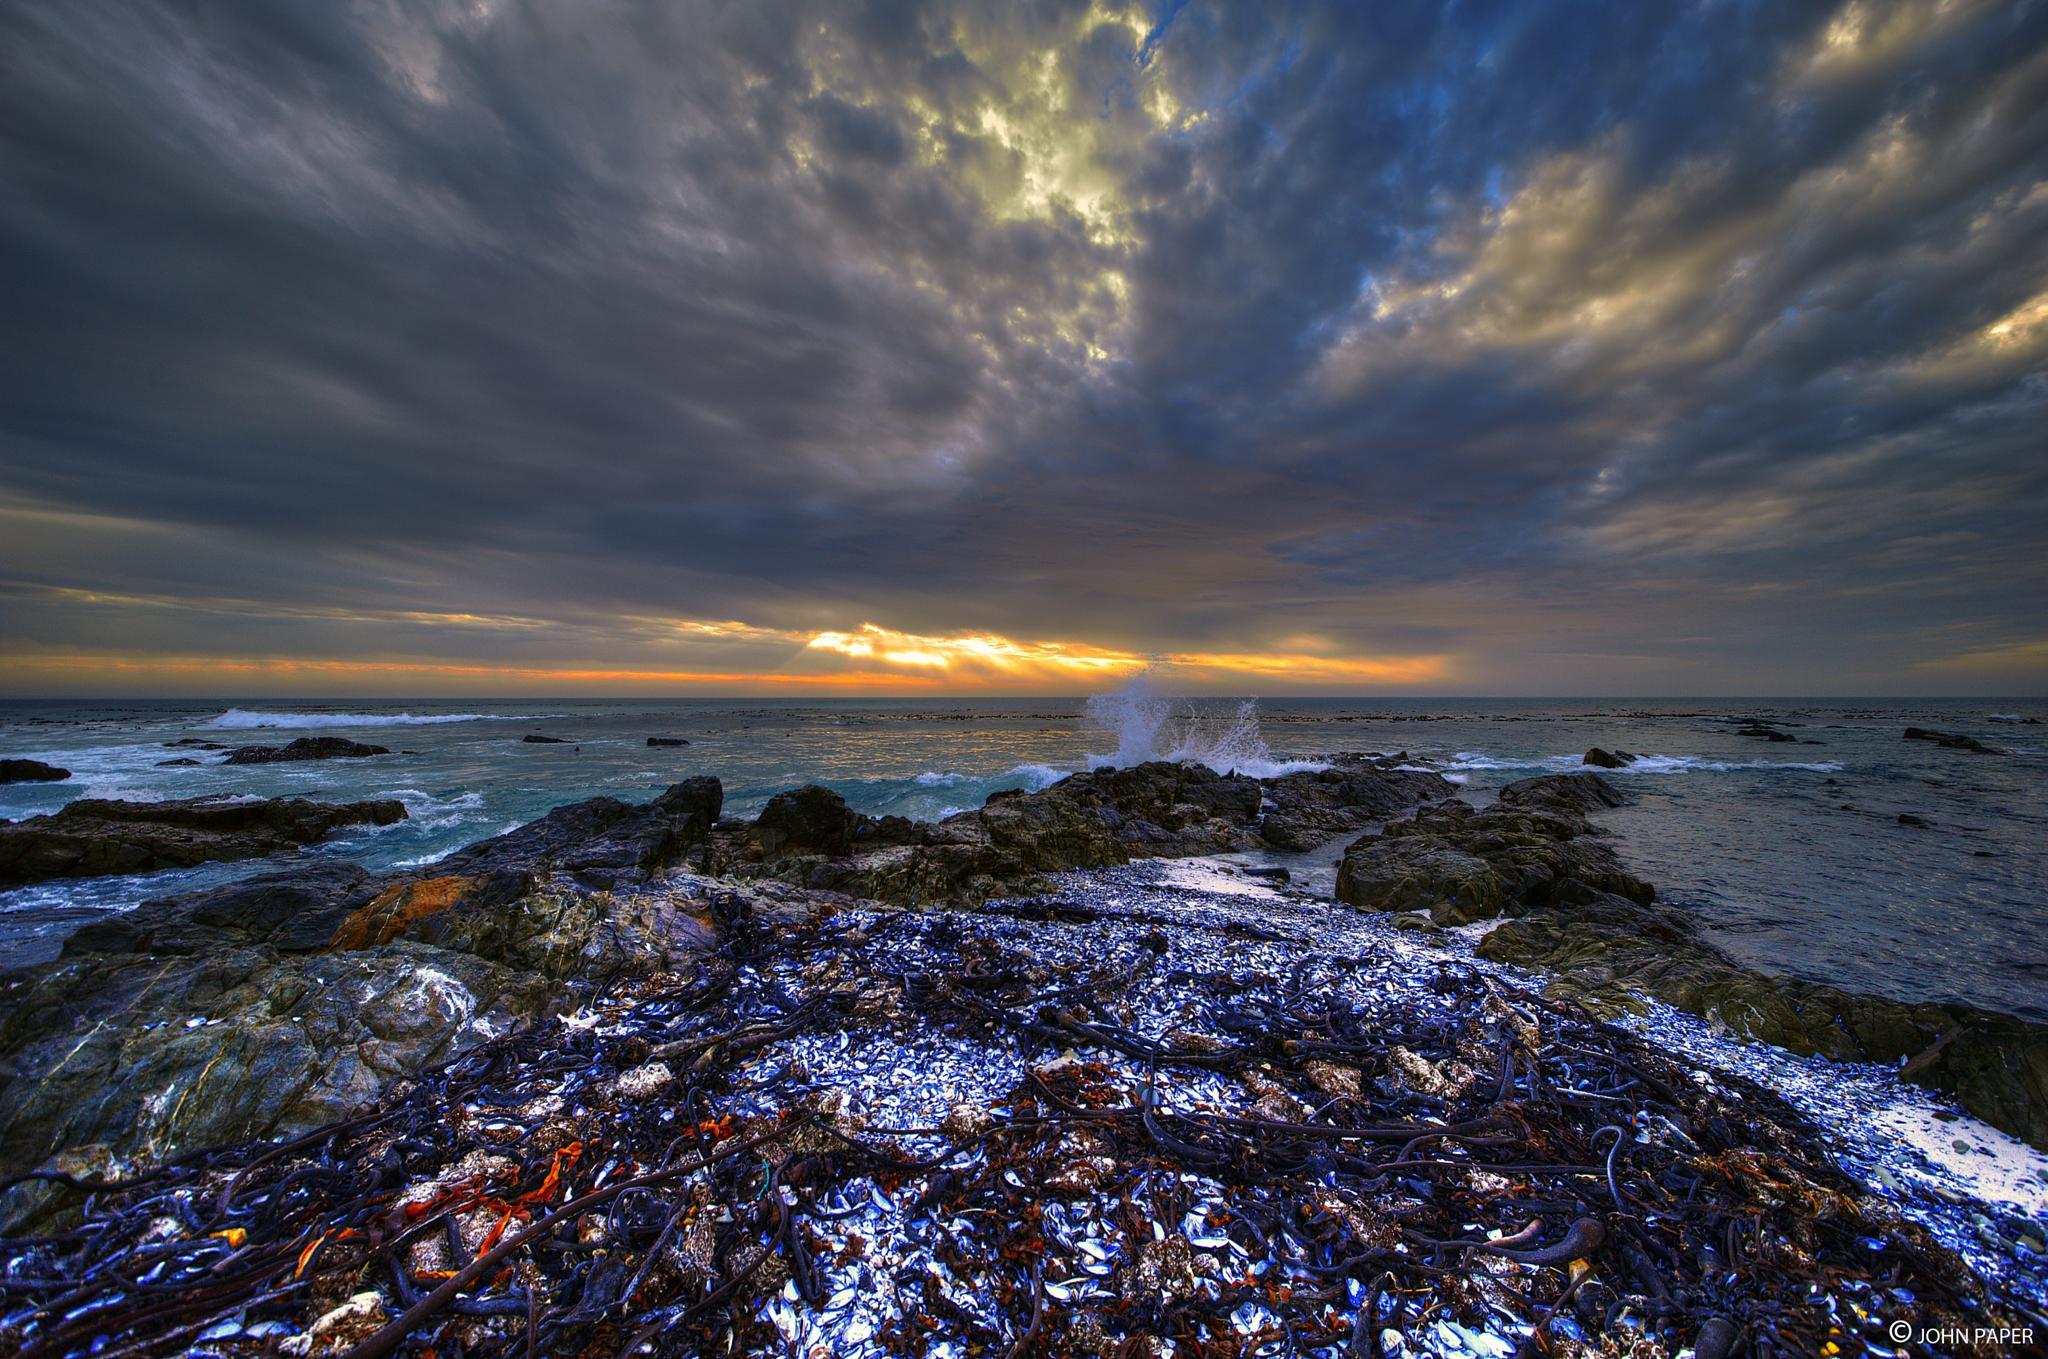 Sunset 3 by John Paper